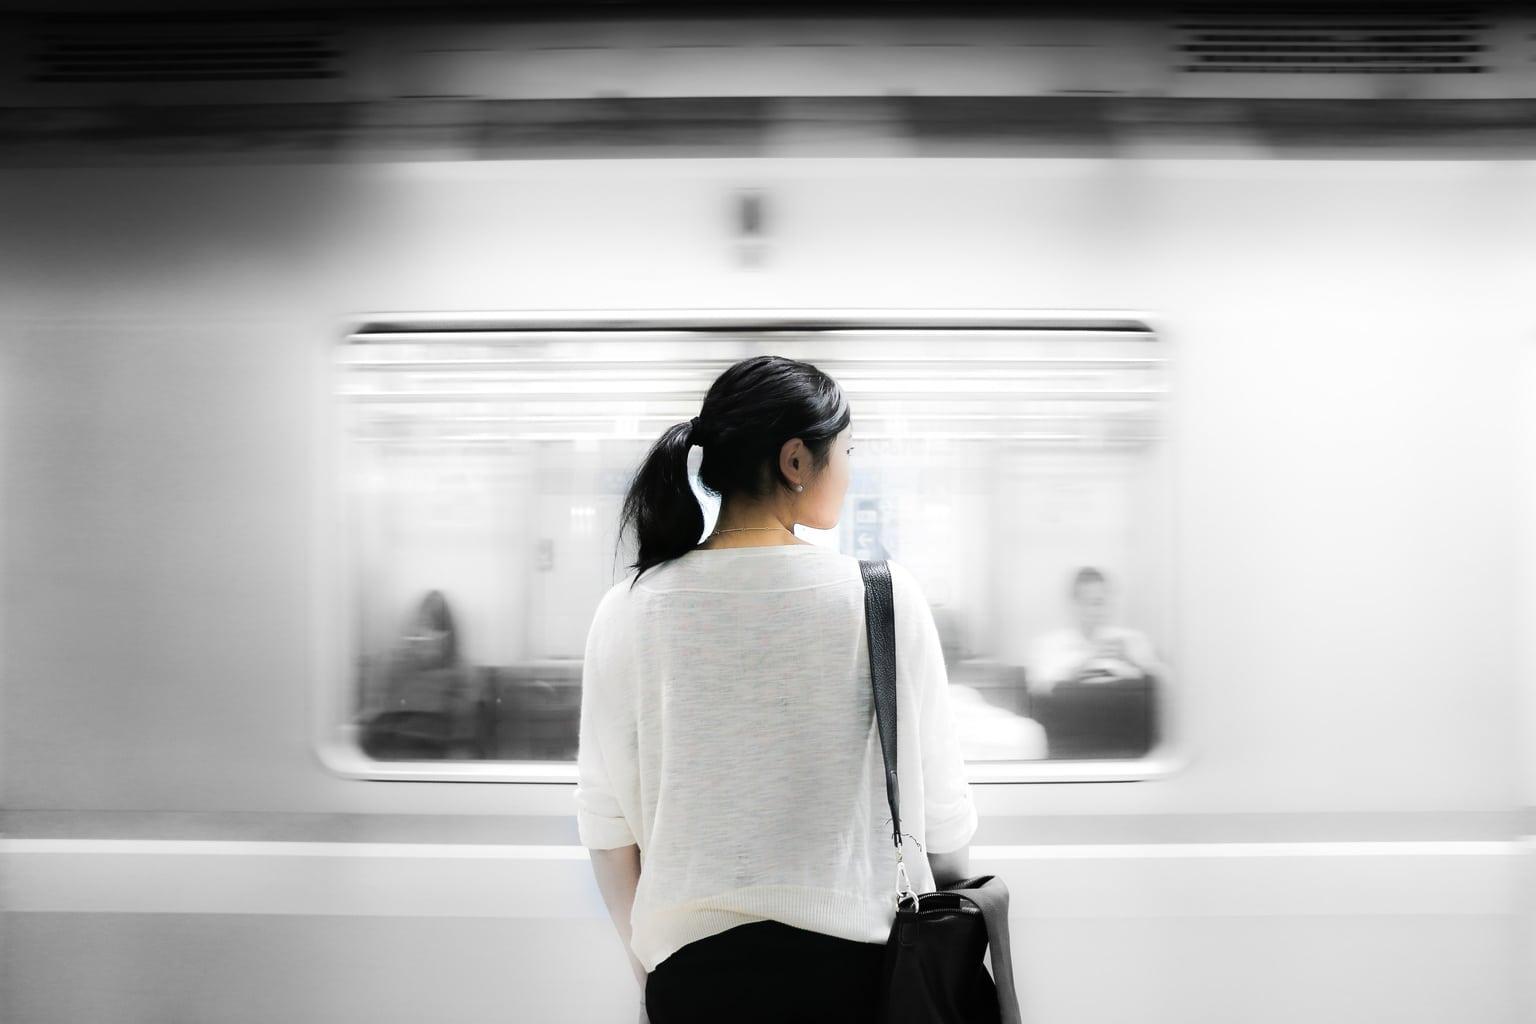 unsplash-train-cover-image